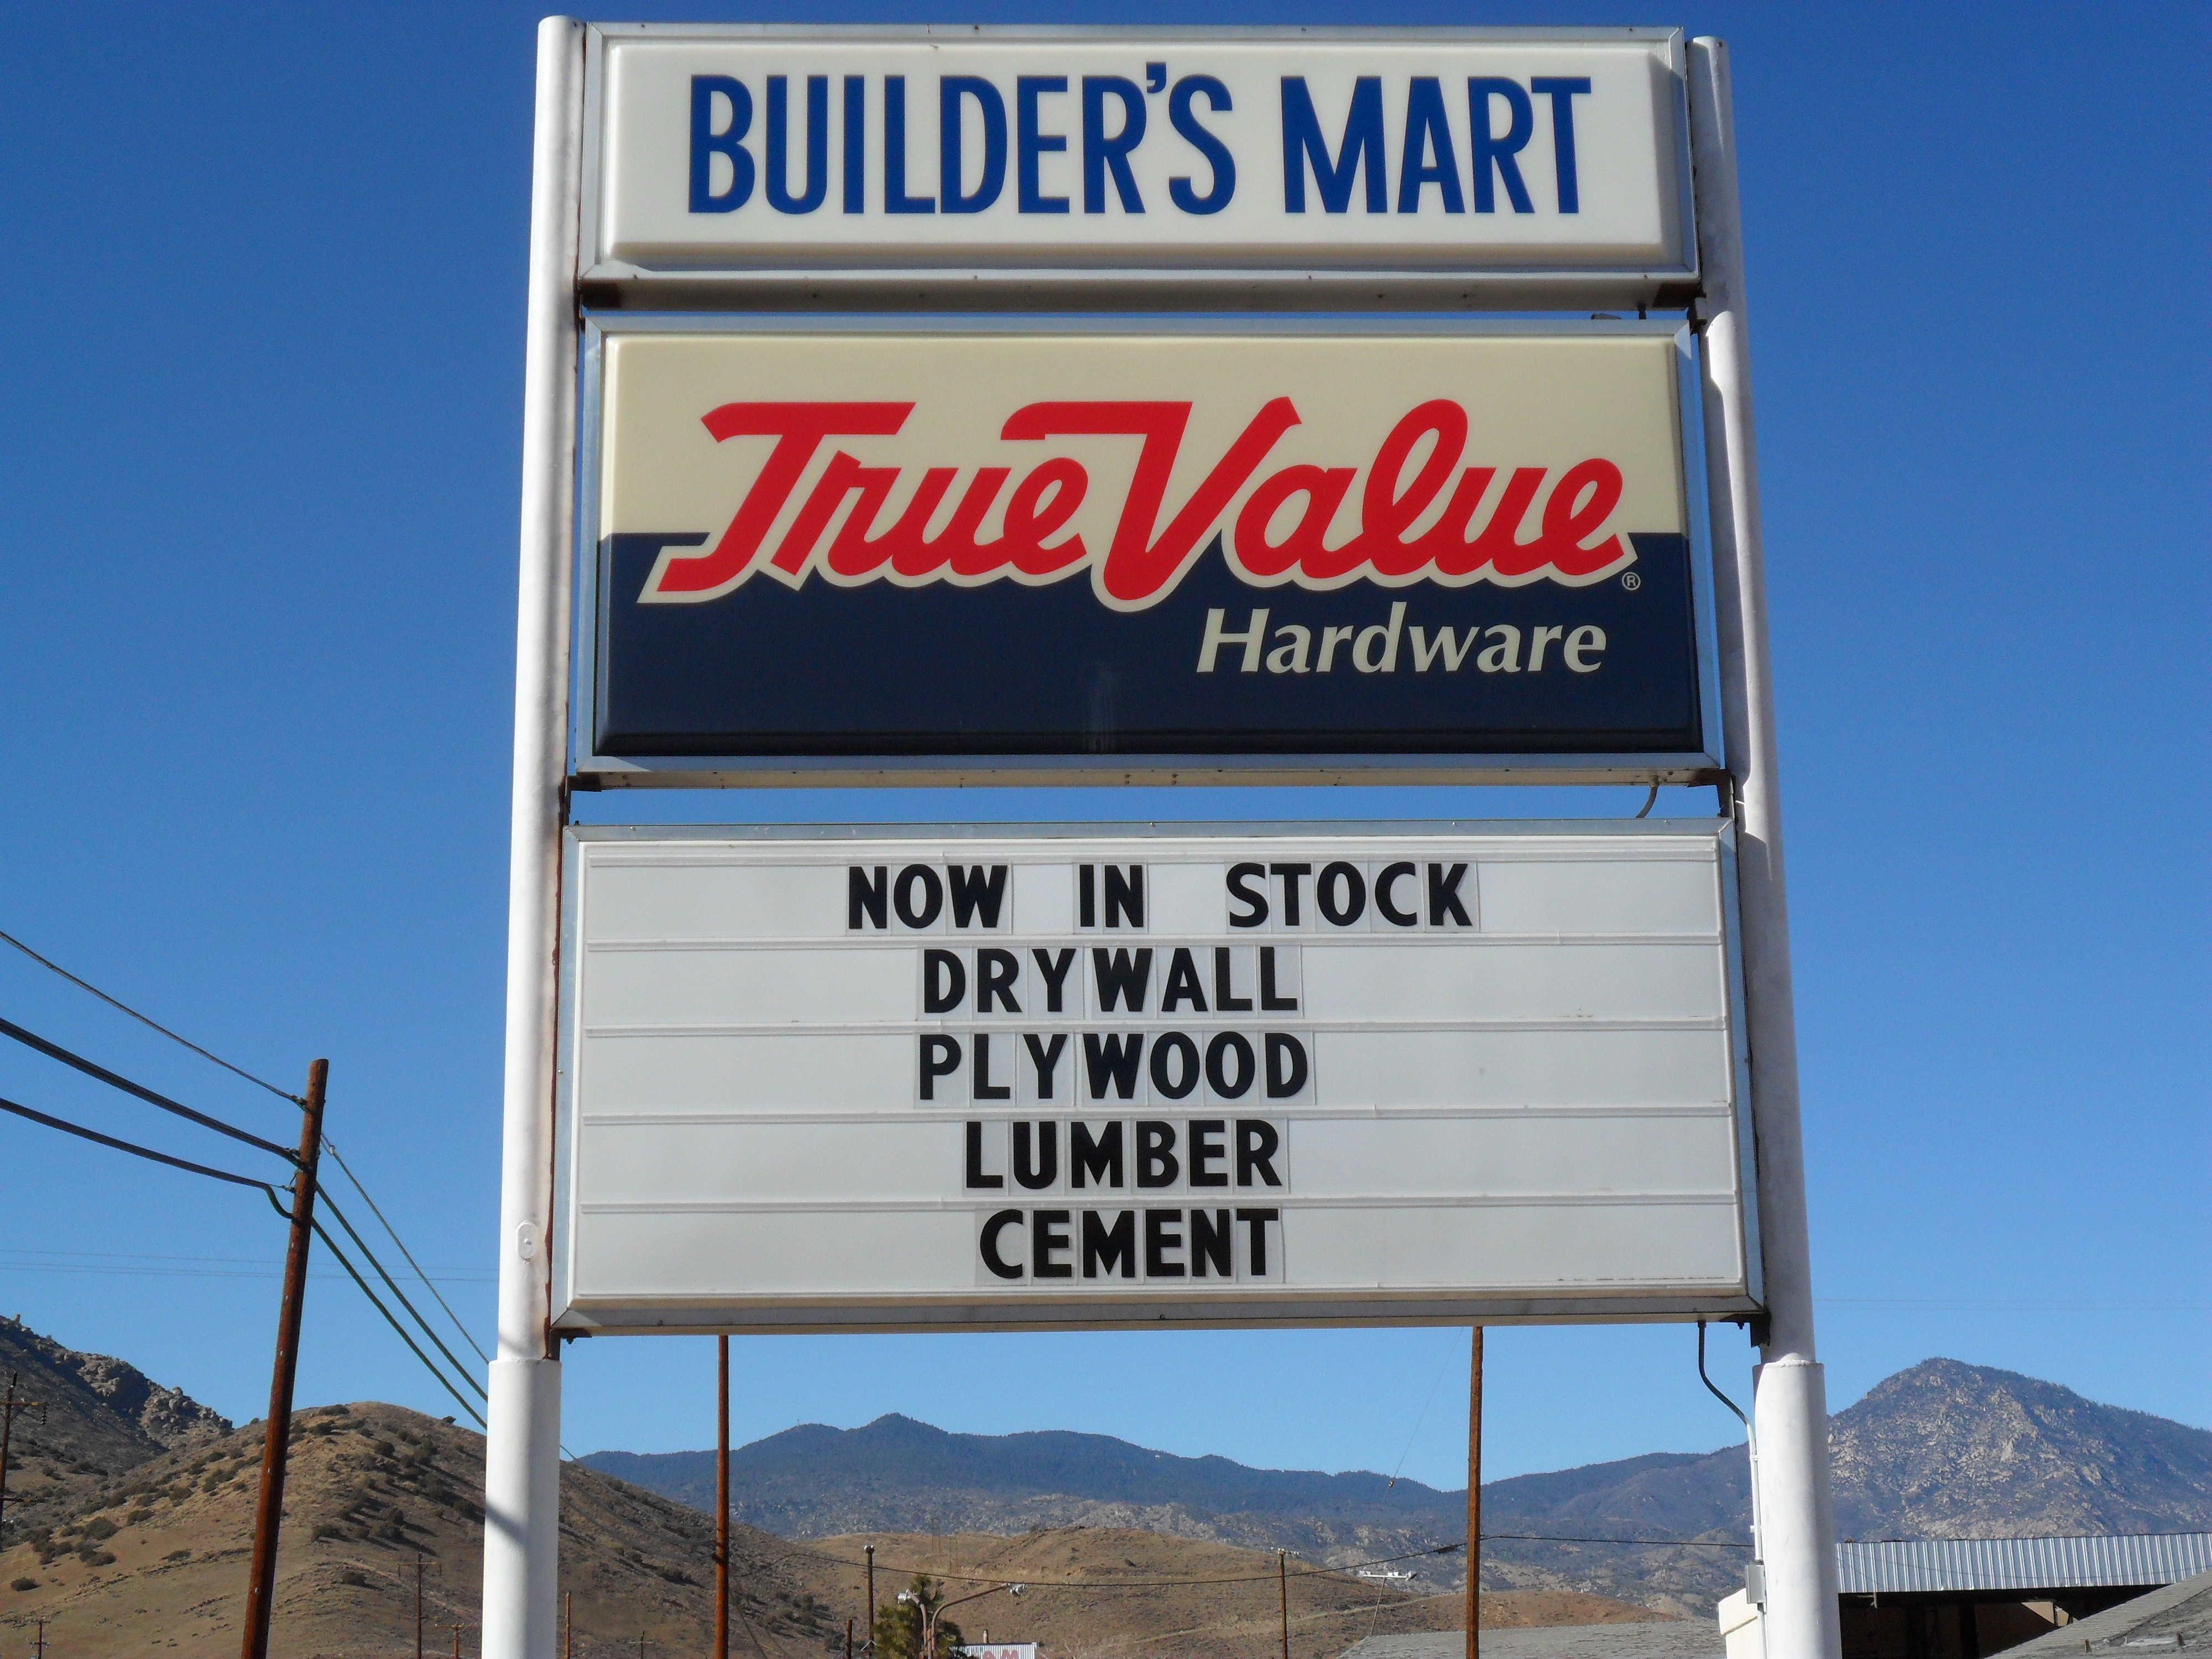 Builder's Mart